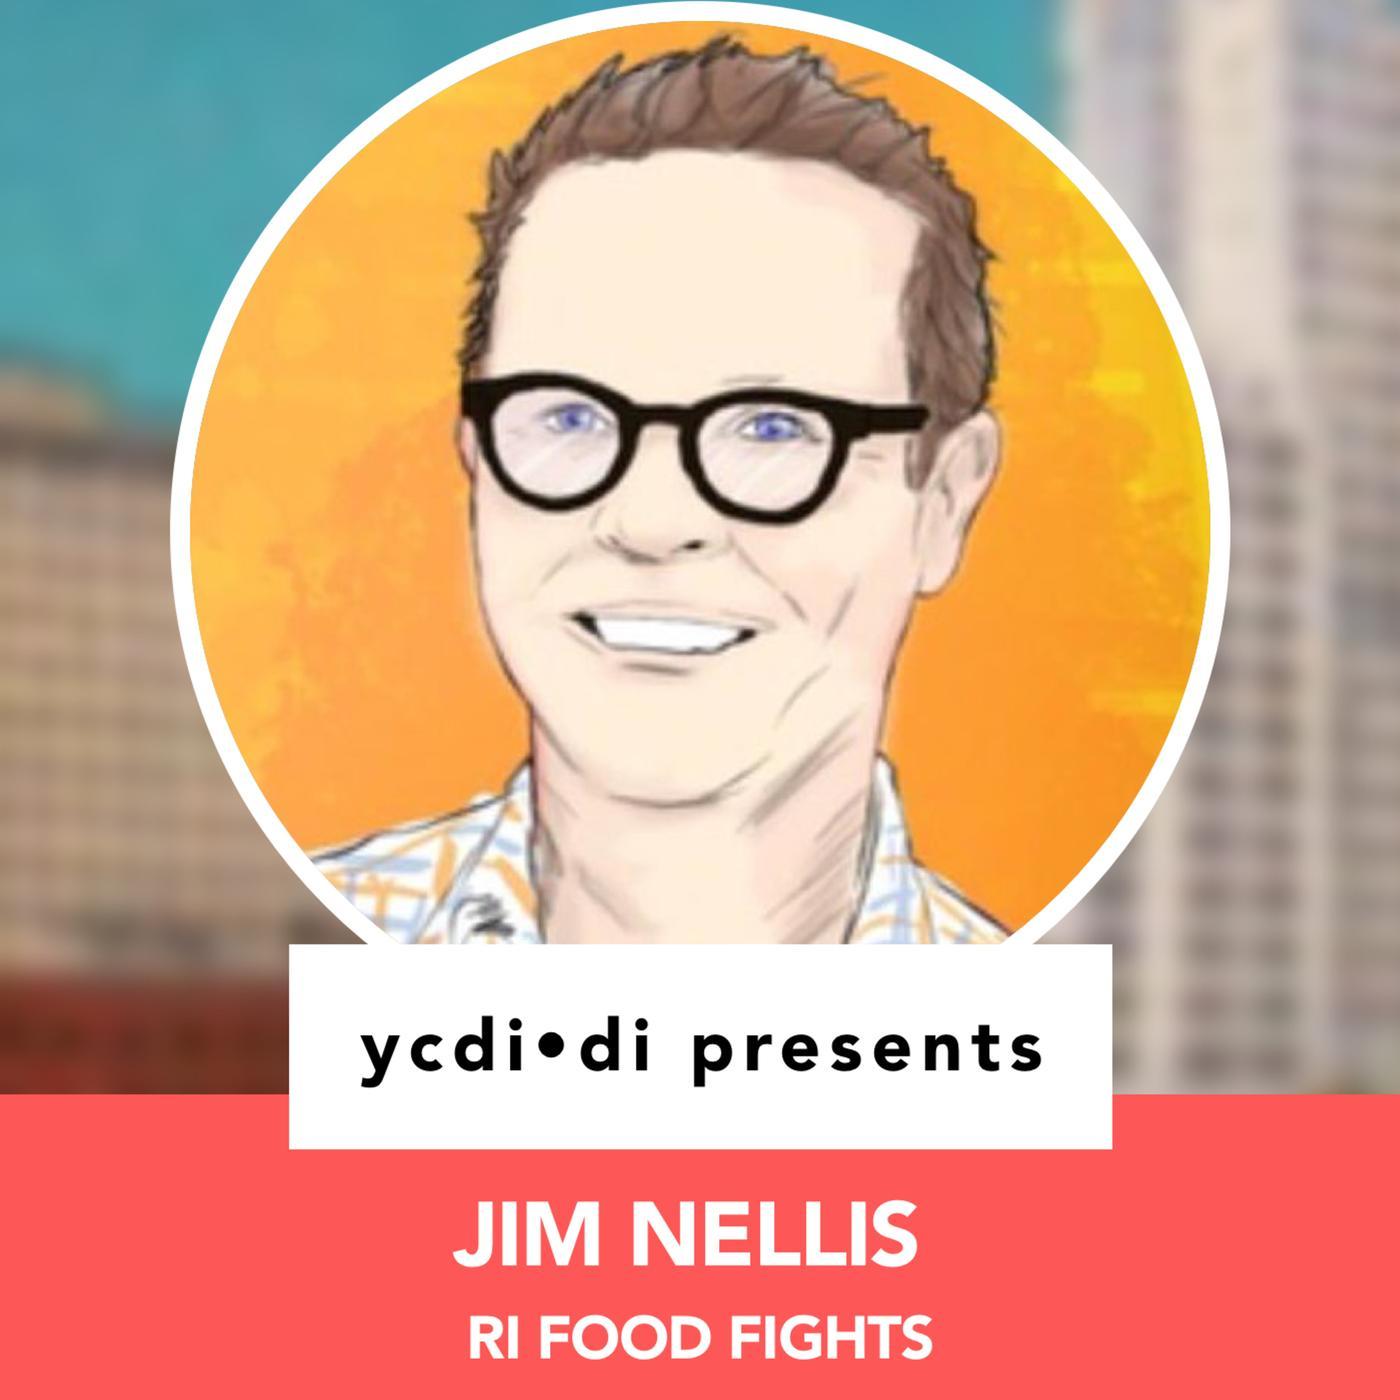 Ri Food Fights >> Jim Nellis Is Running Ri Food Fights Ycdi Di You Can Do It Do It